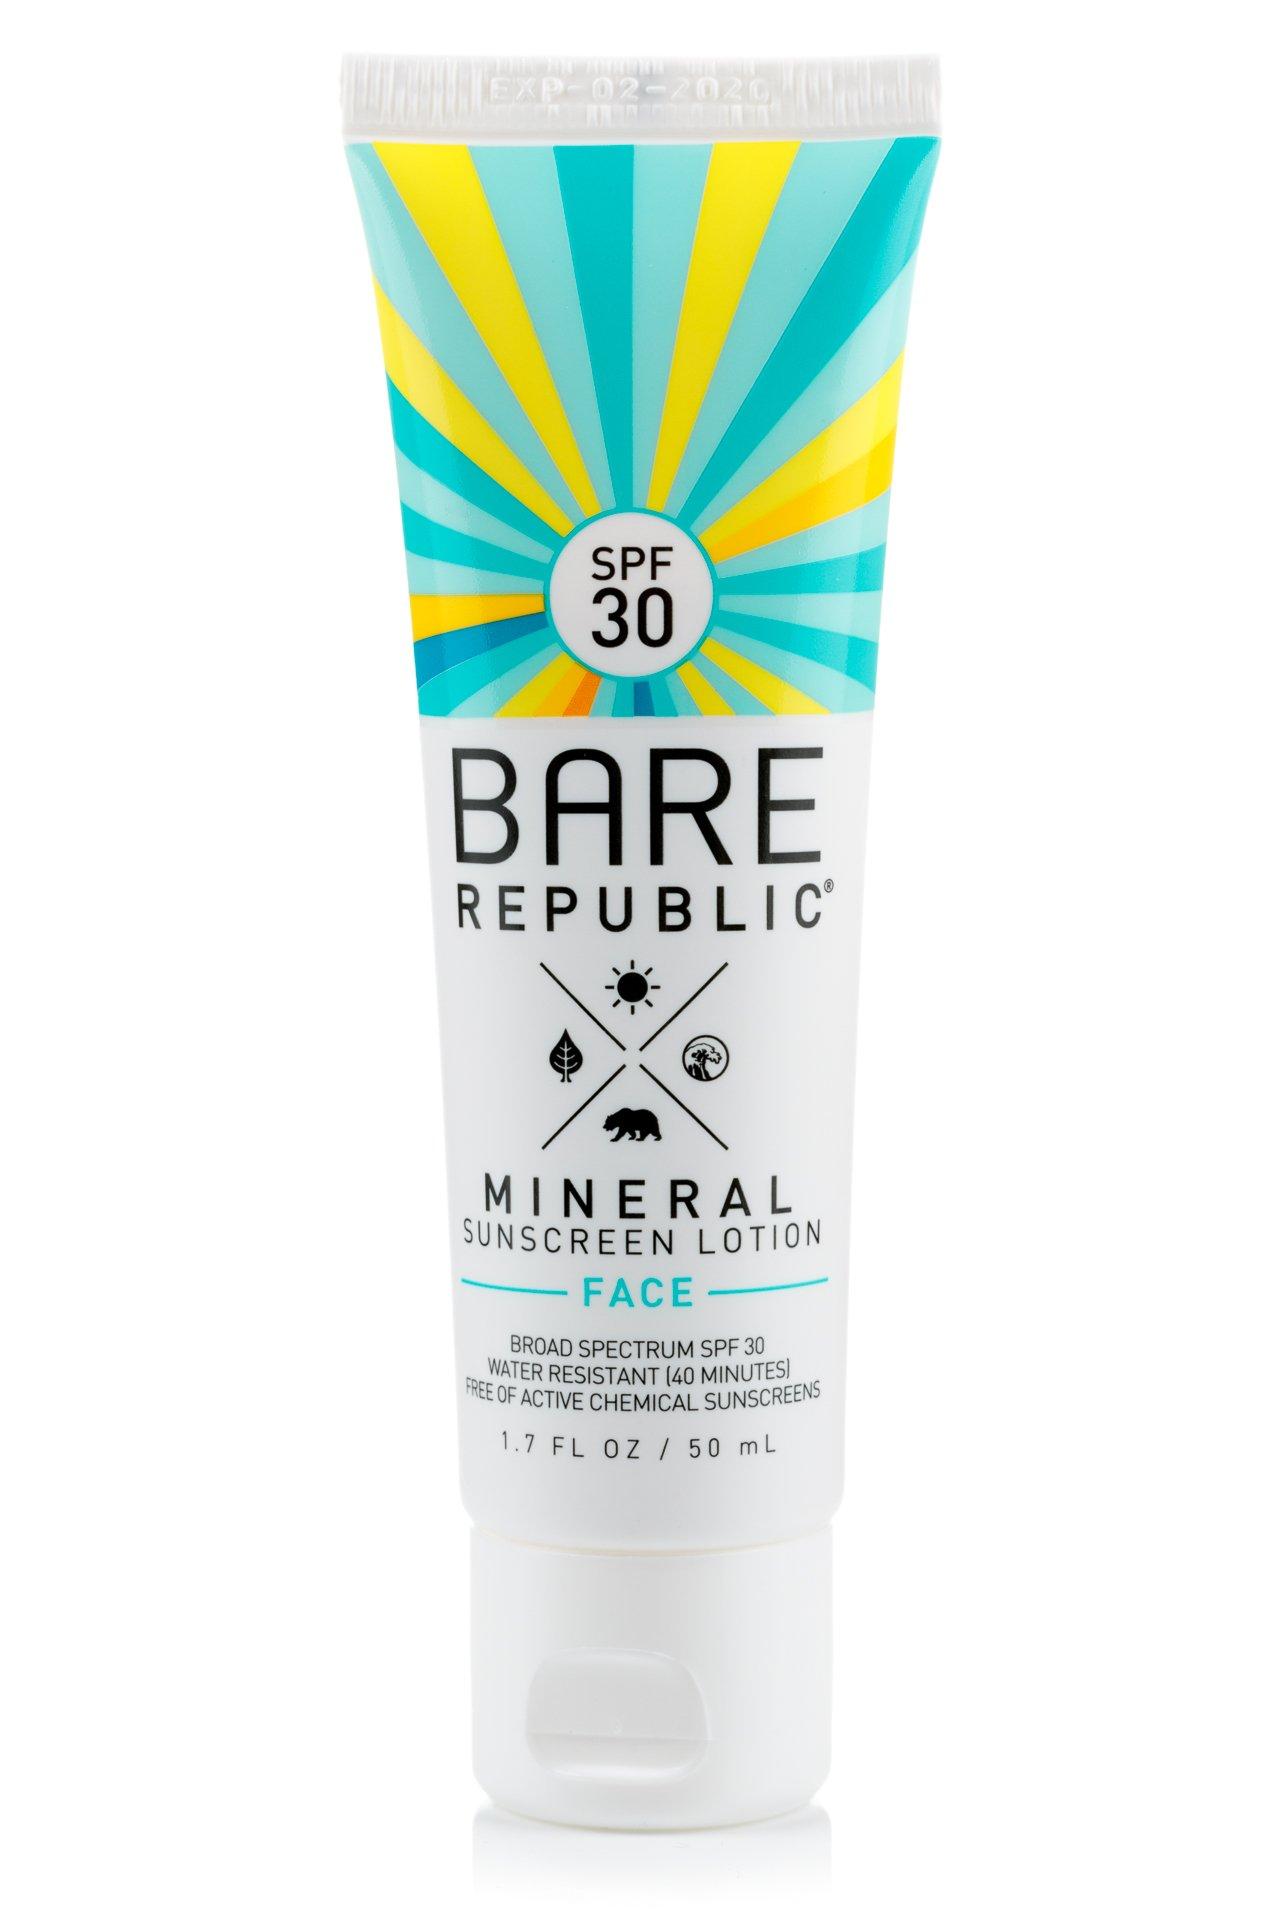 Bare Republic Spf30 Clearscreen Gel 5 Oz Beauty Nature Bath Body Lotion Apple Mango Mineral Face Sunscreen Spf 30 17